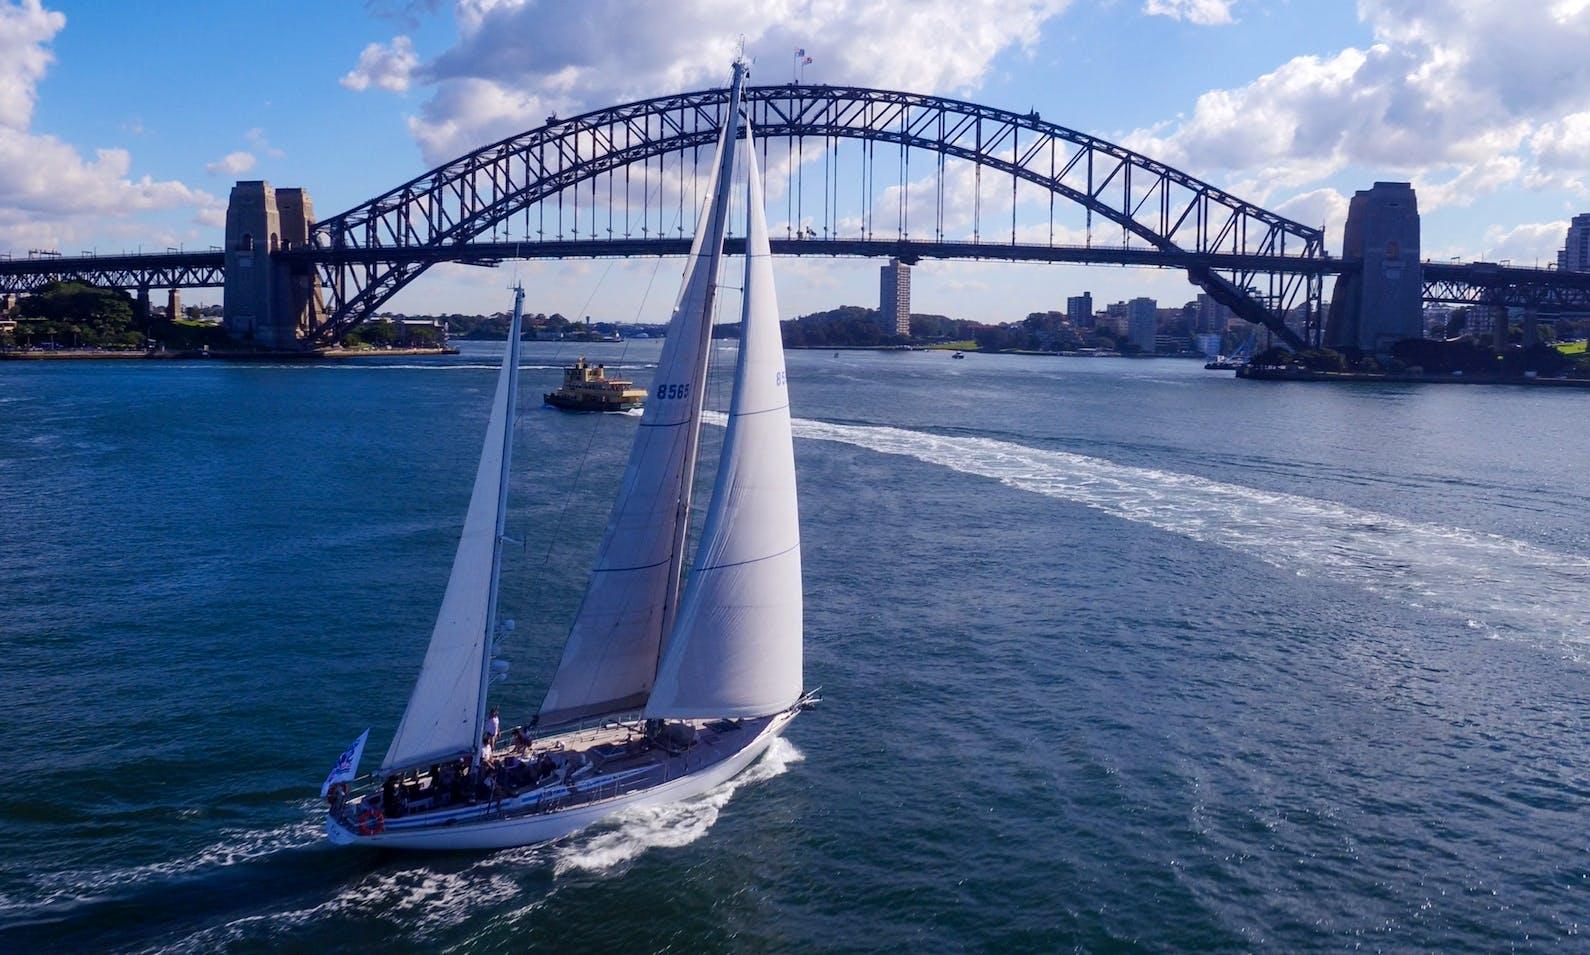 Swan 65 ketch in Sydney Harbour